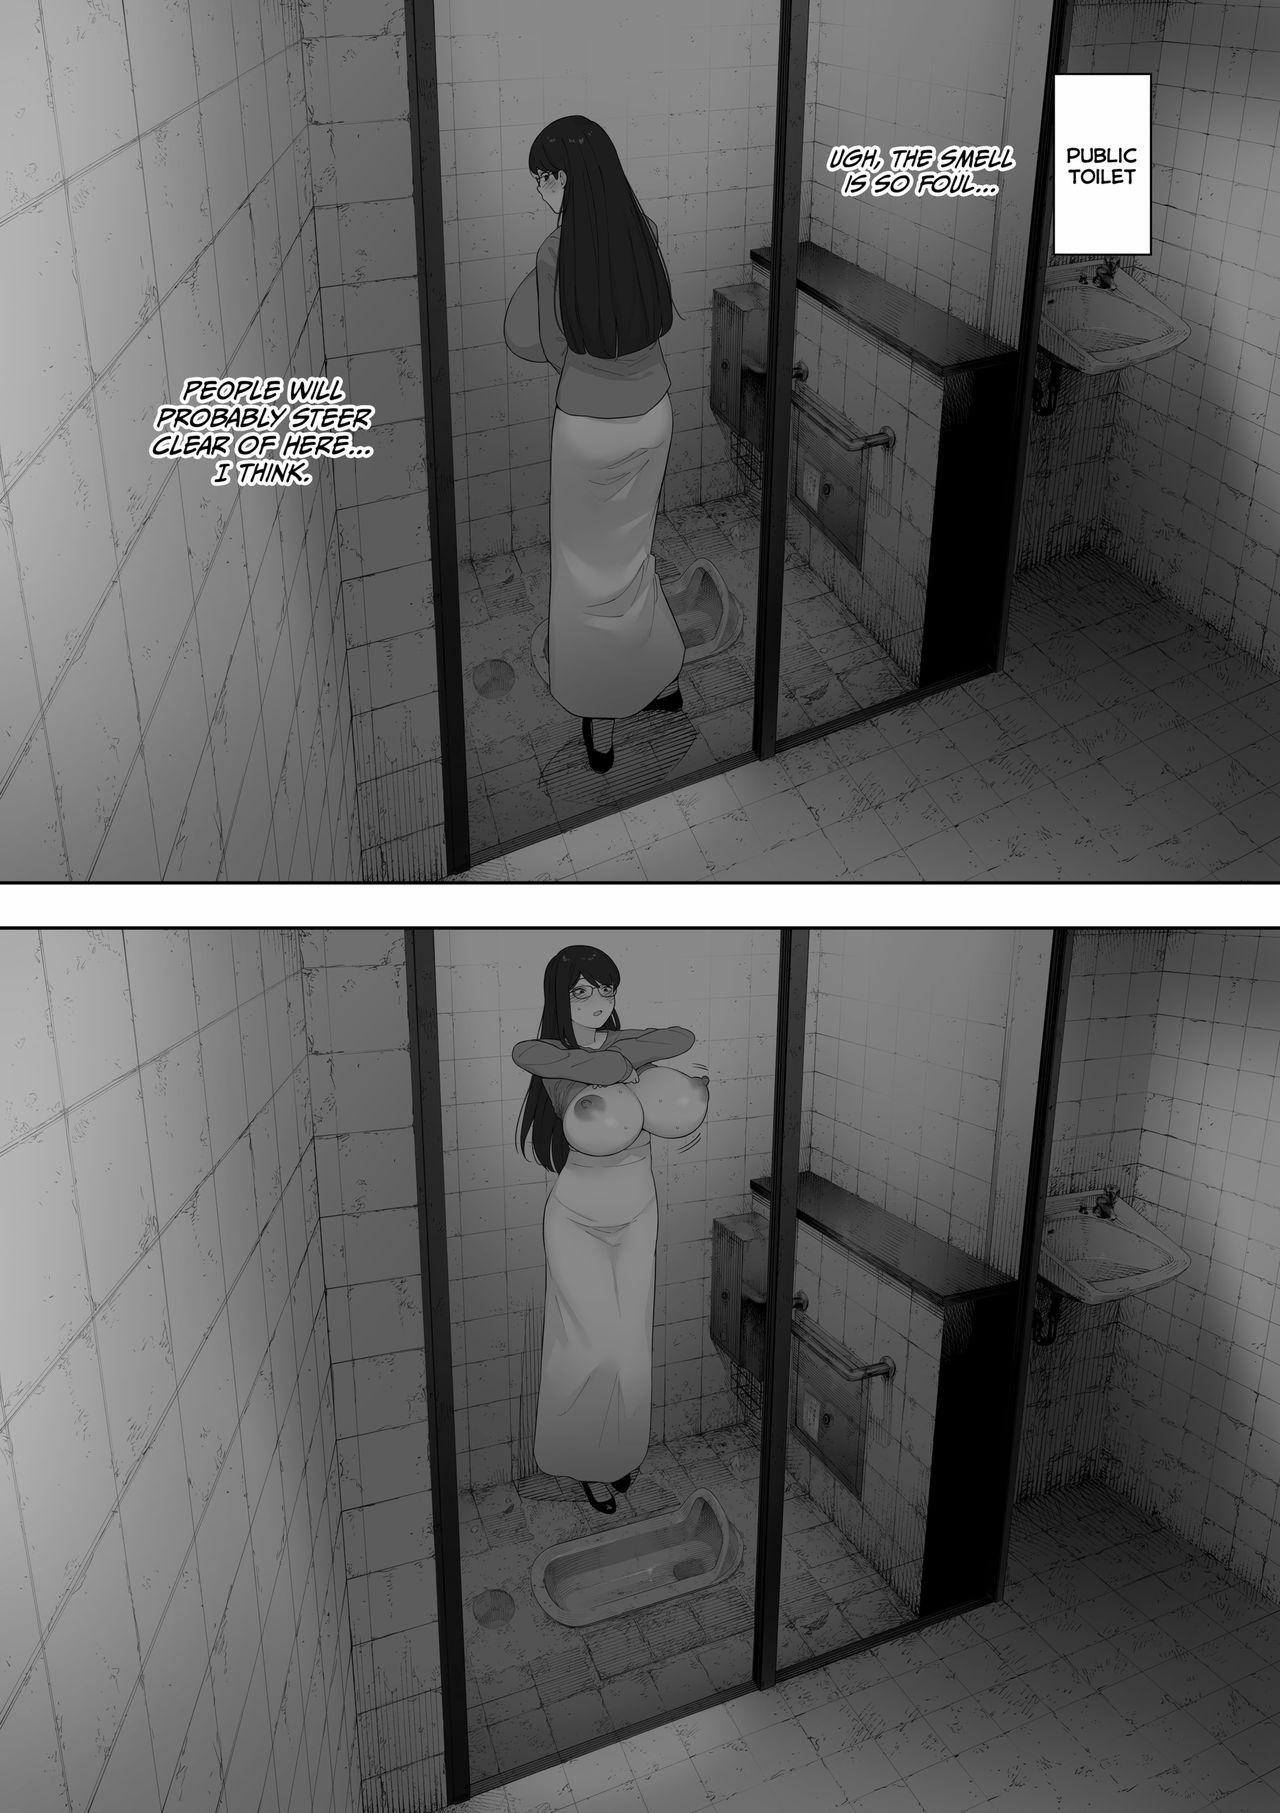 [NT Labo (NT Robo)] Aisai, Doui no Ue, Netorare Roshutsu | [NT Labo(NT Robo)] Cucked With_My Consent My Exhibitionist Wife [English] 41